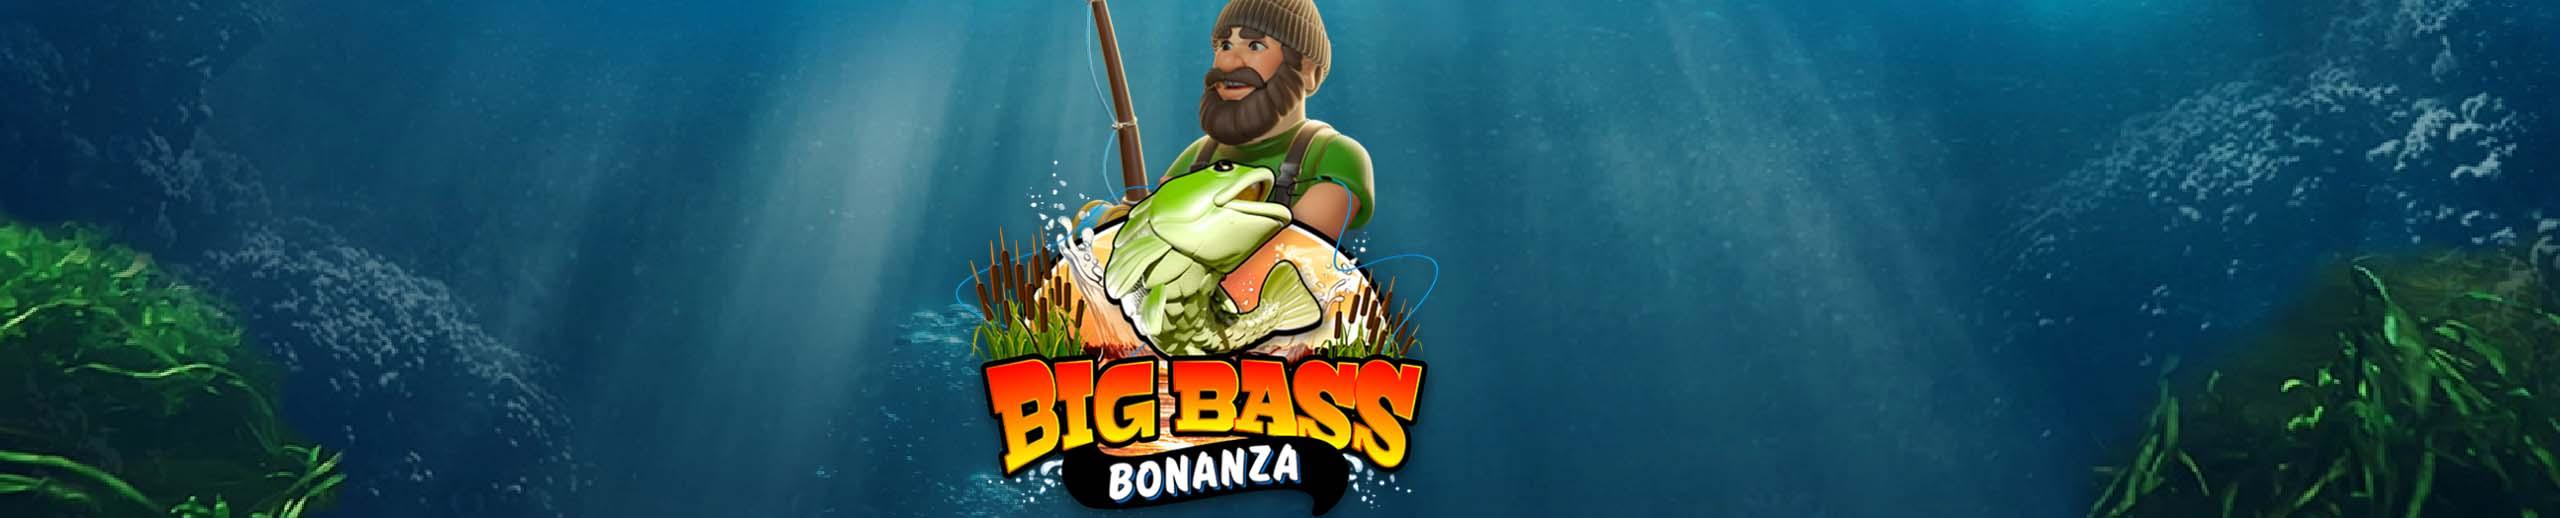 Big Bass Bonanza Online Slot Test